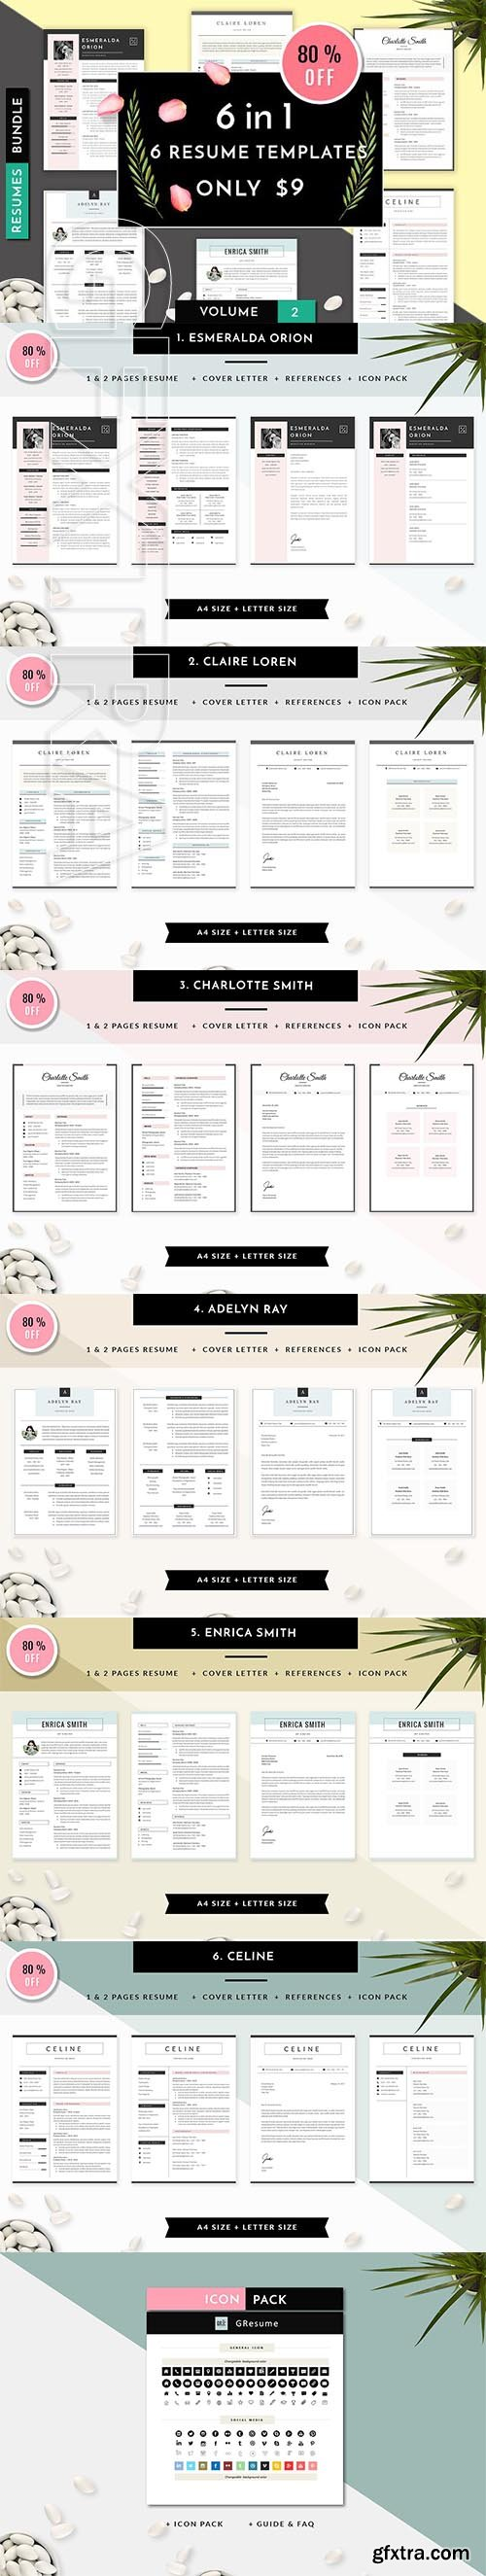 CreativeMarket - 6 in 1 Resume Templates Bundle Vol 2 2107384